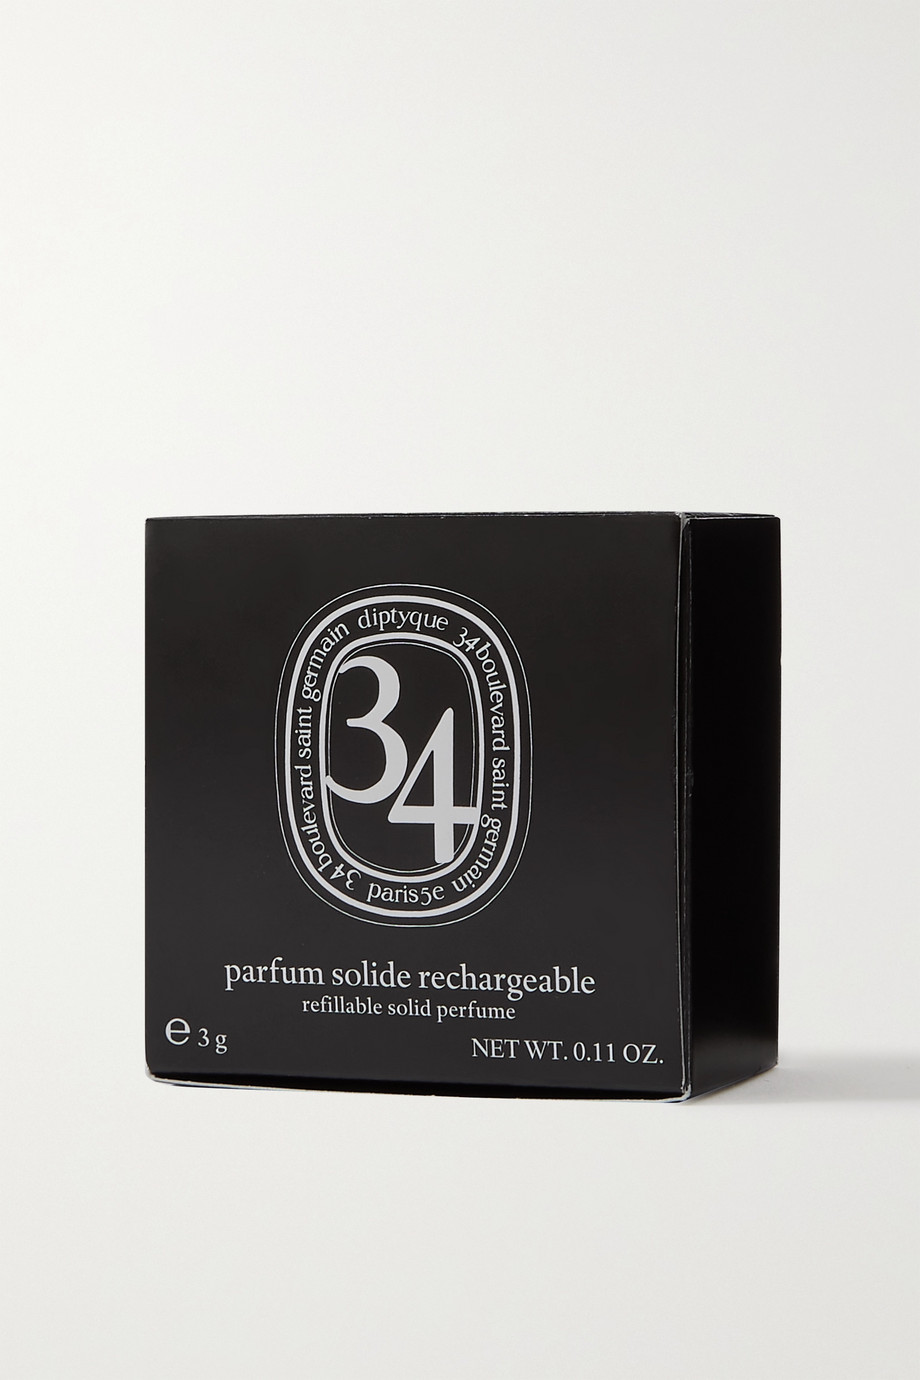 Diptyque Parfum solide rechargeable 34 Boulevard Saint Germain, 3 g